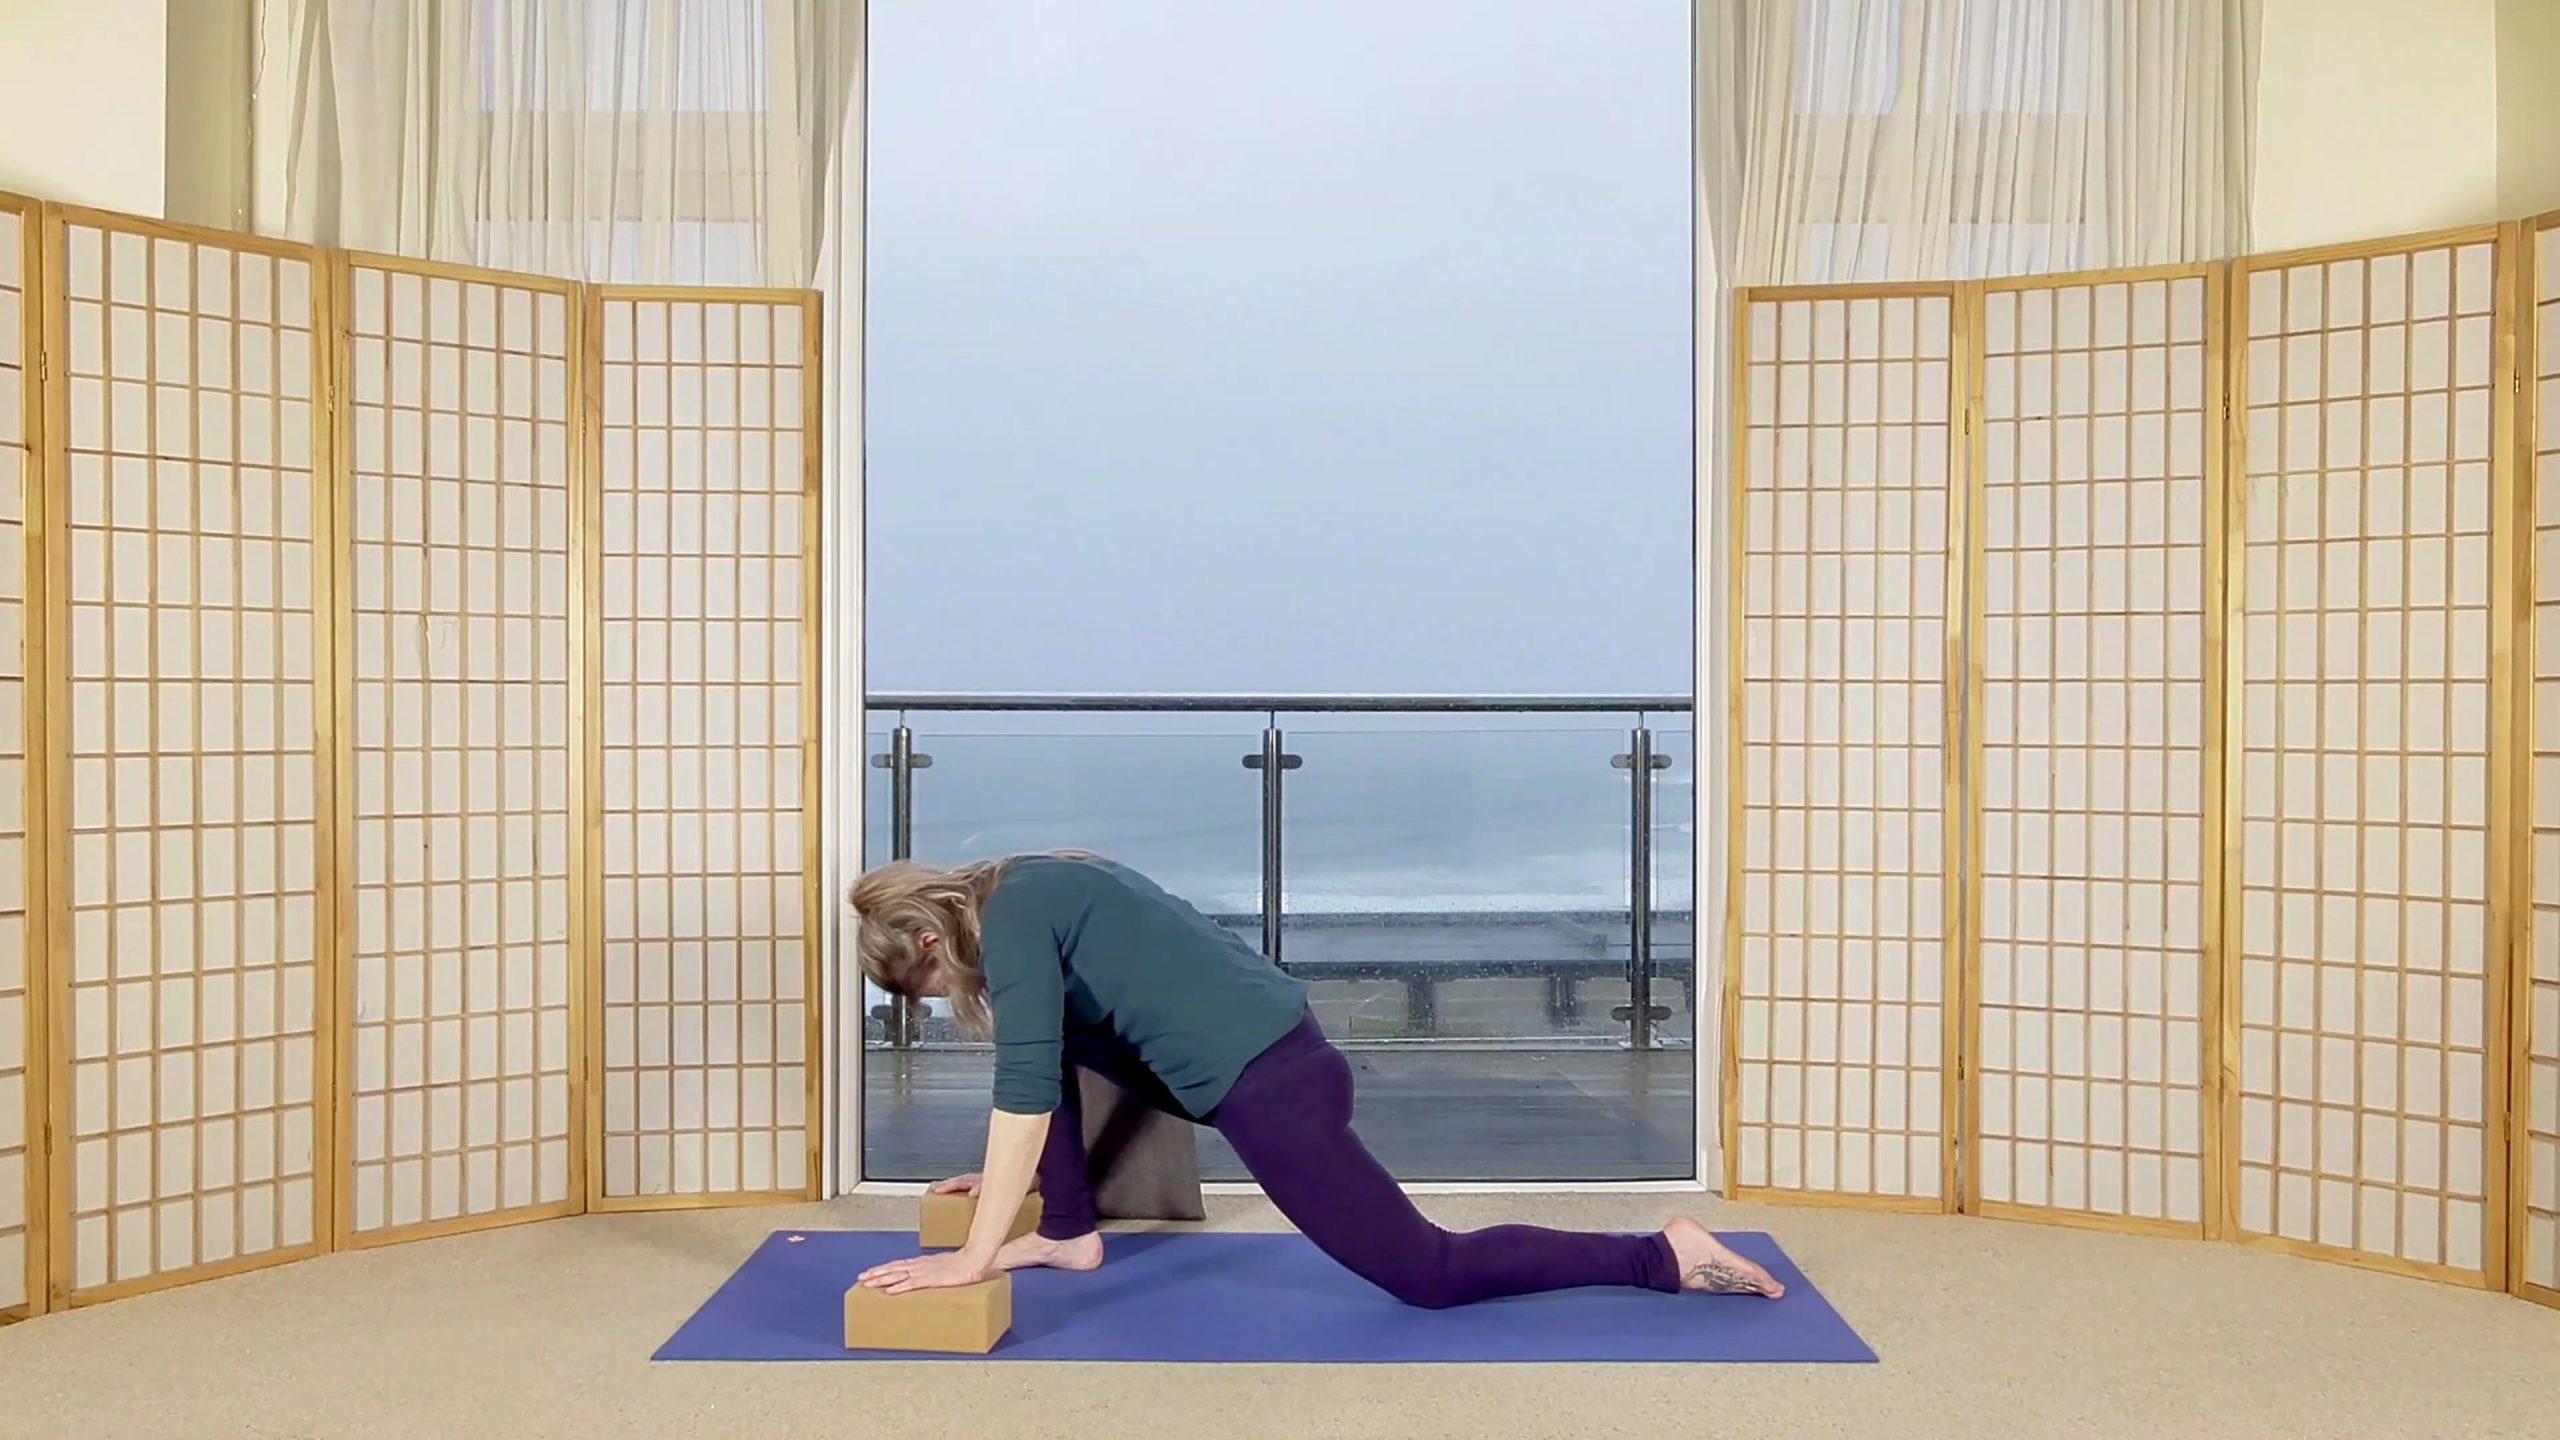 slow flow 30 slow steady headspace meditation flow online on demand yoga